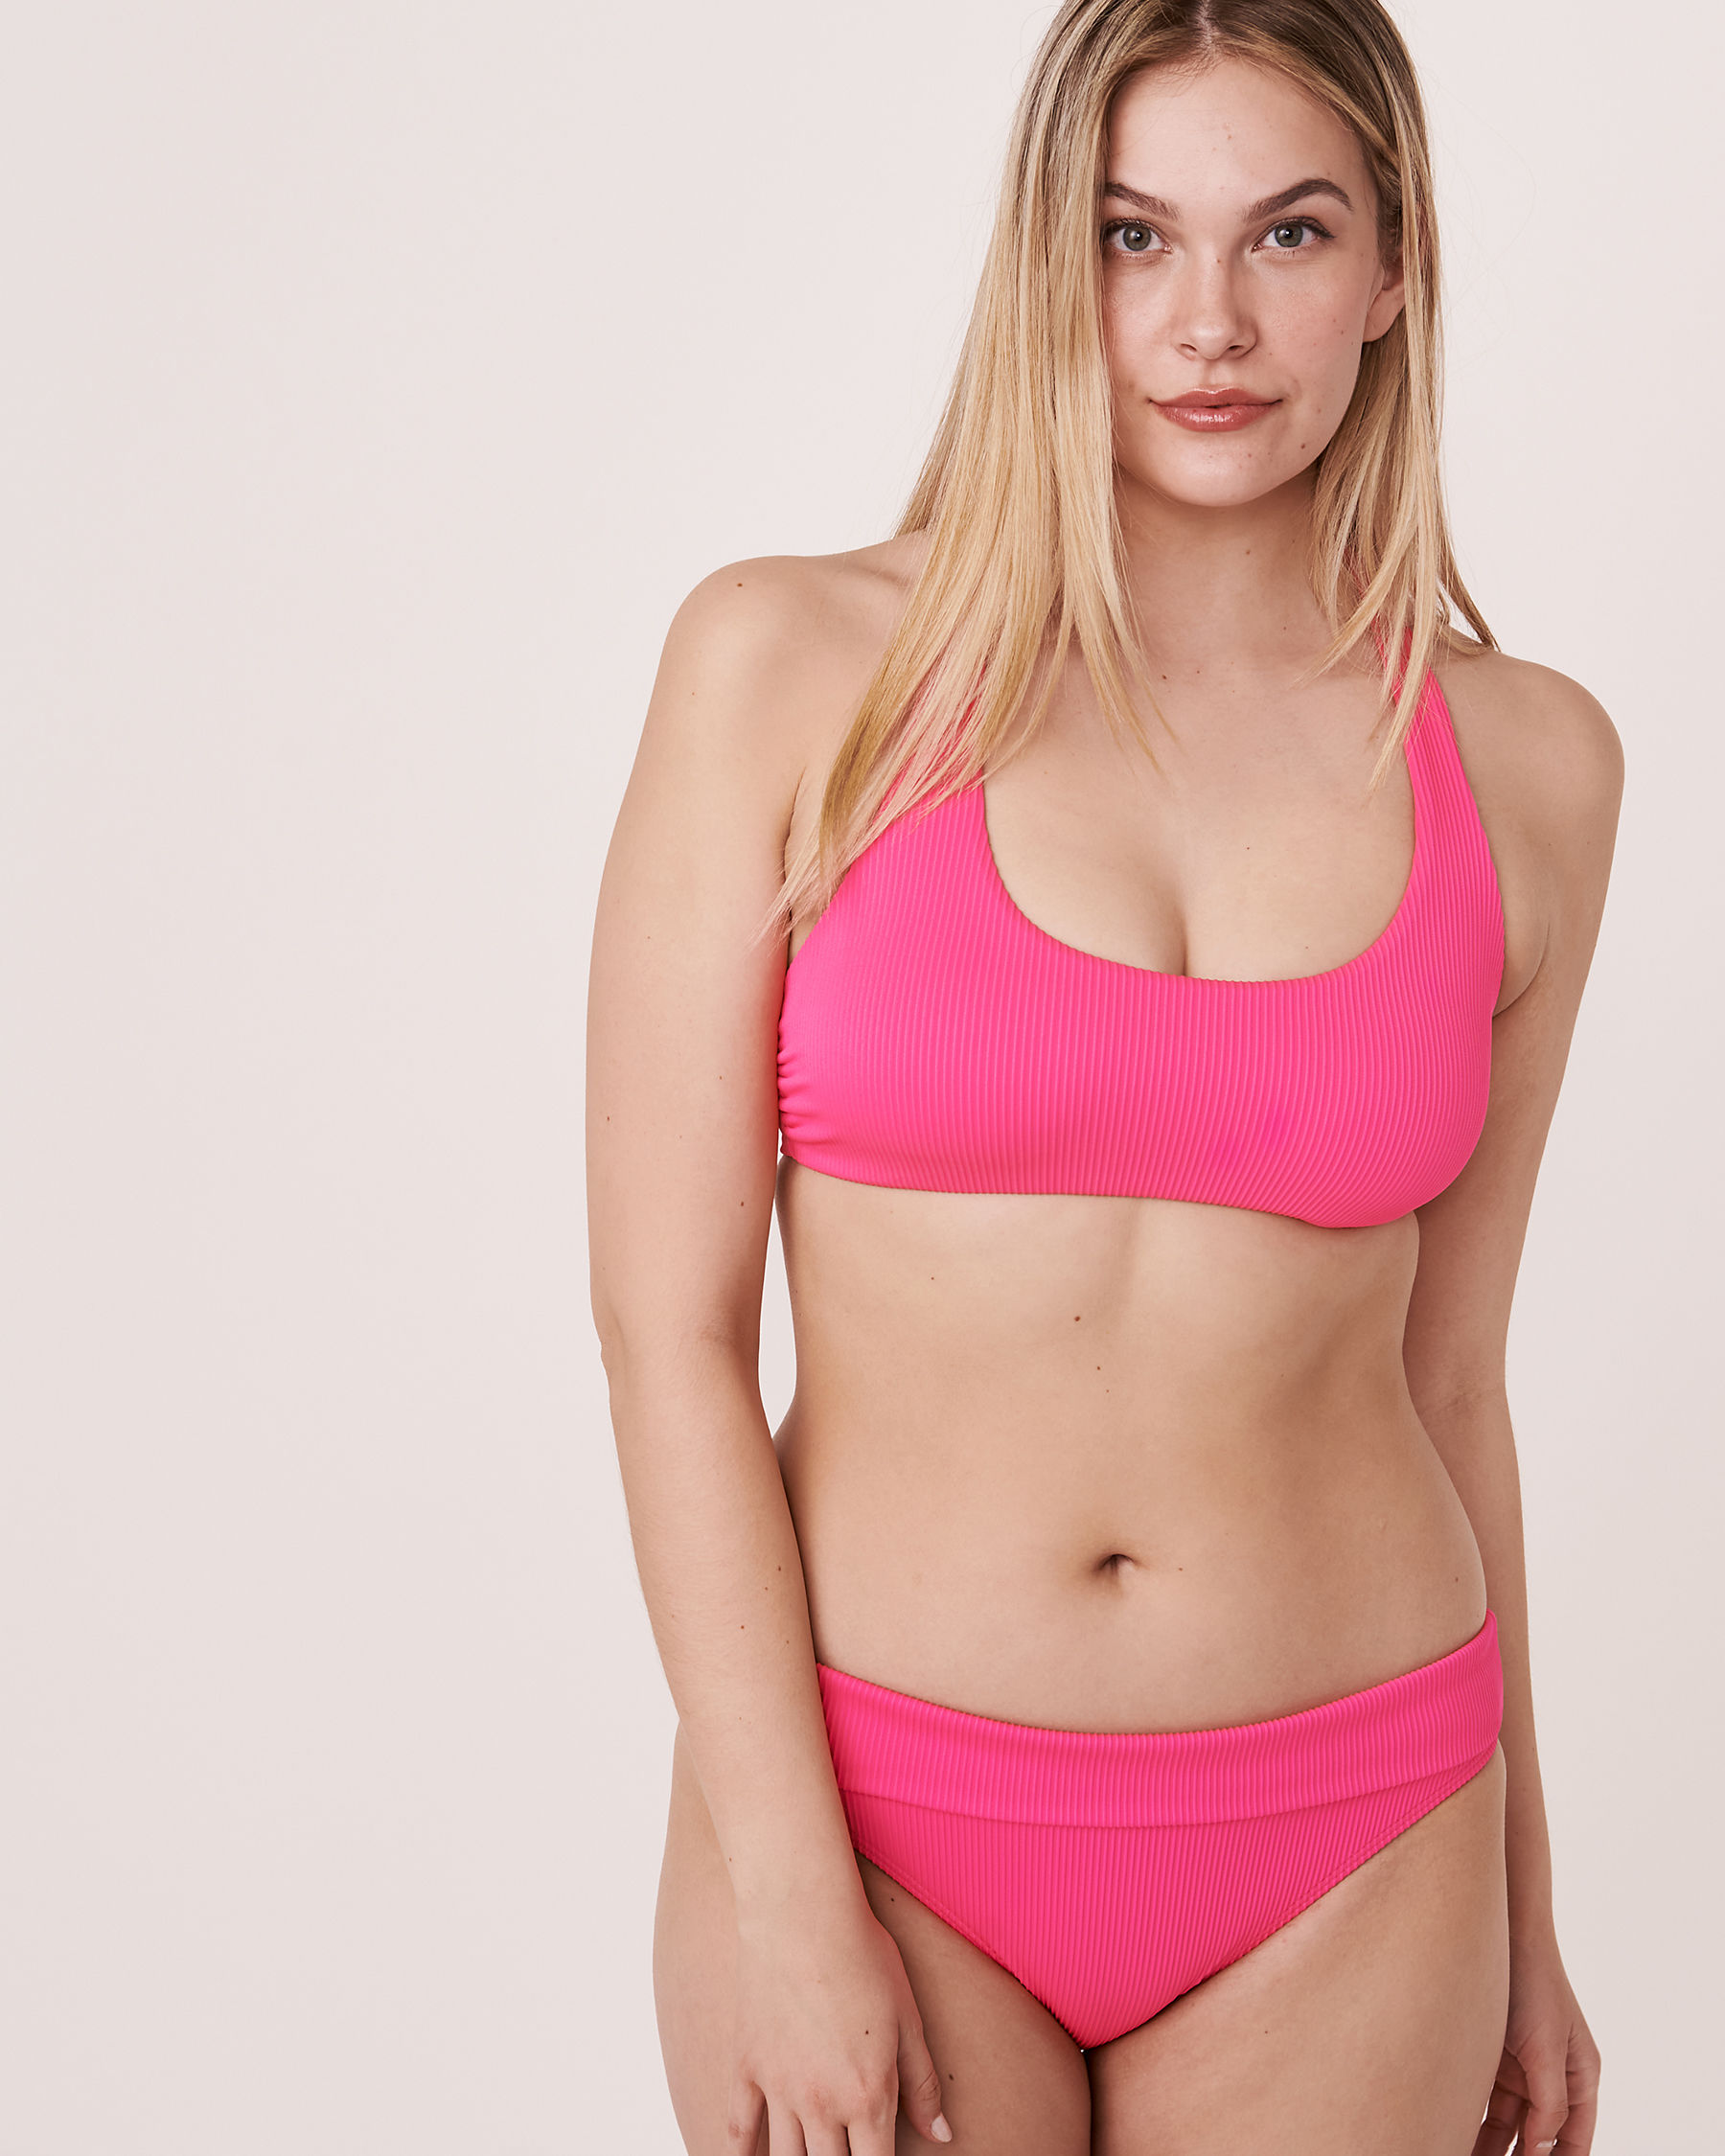 LA VIE EN ROSE AQUA Bas de bikini bande de taille pliable en fibres recyclées TOOTSIE RIB Rose néon 70300063 - Voir5